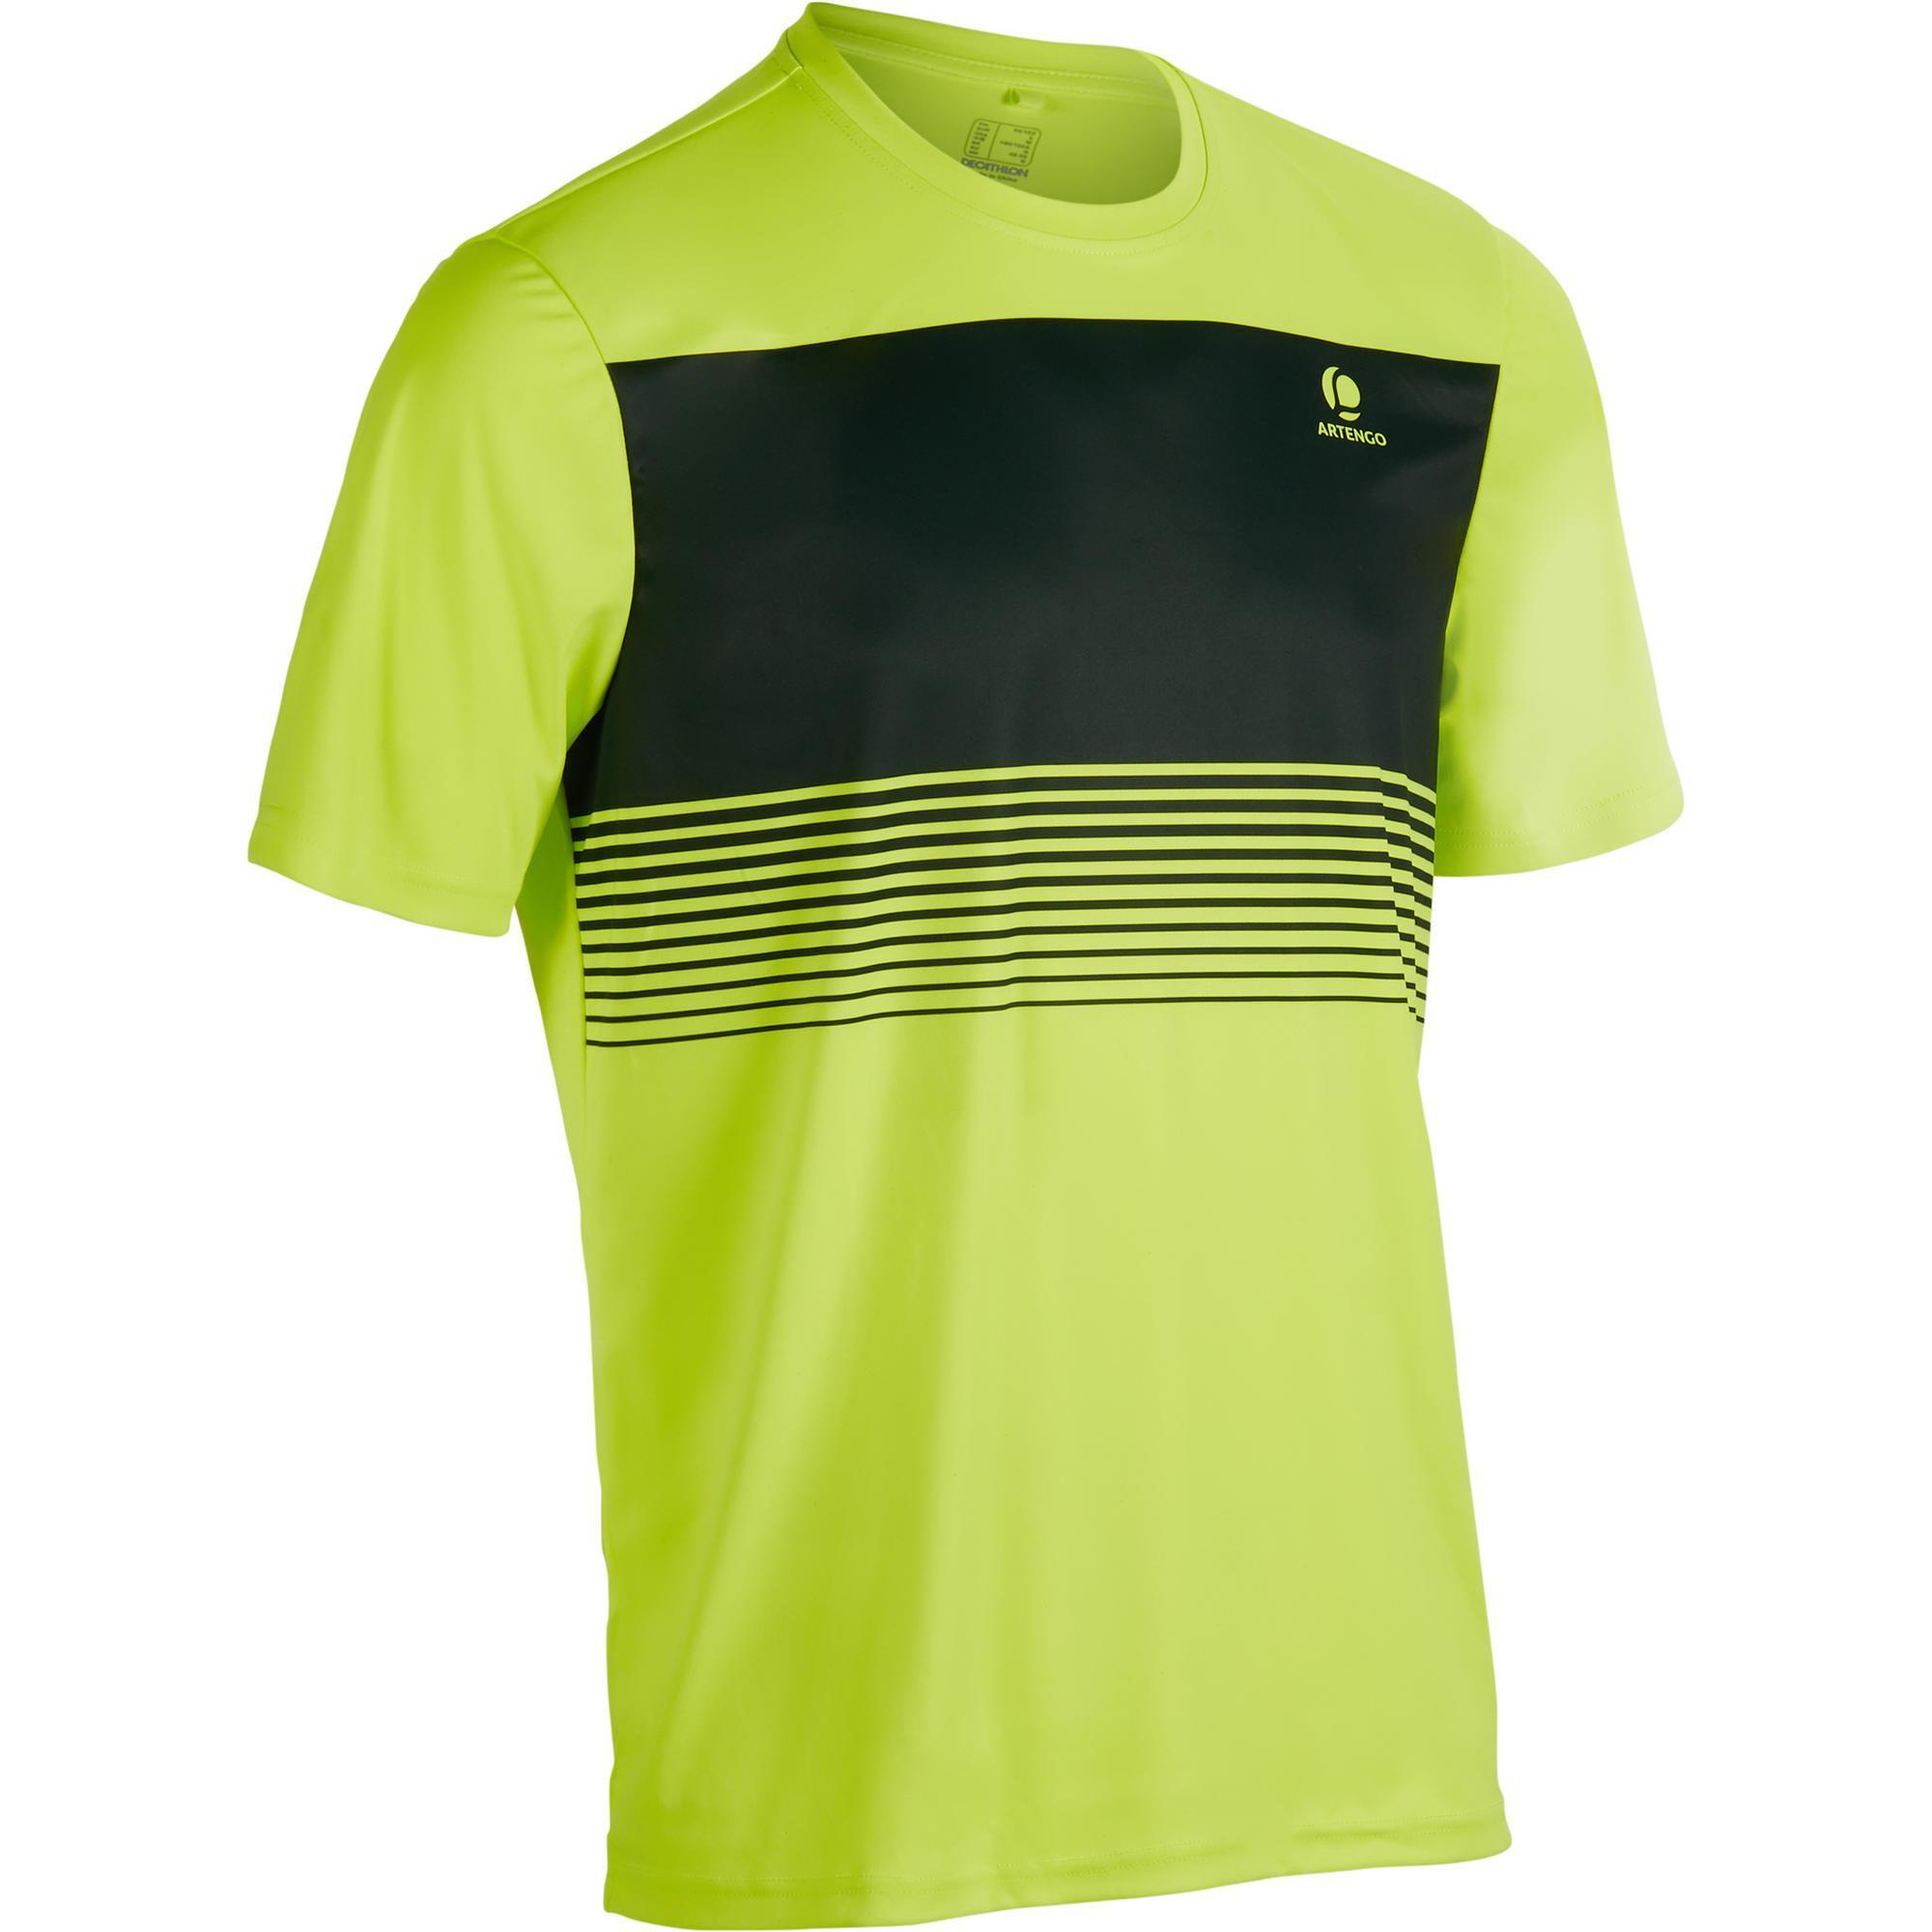 Artengo Tennis T-shirt heren Soft 100 fluogeel